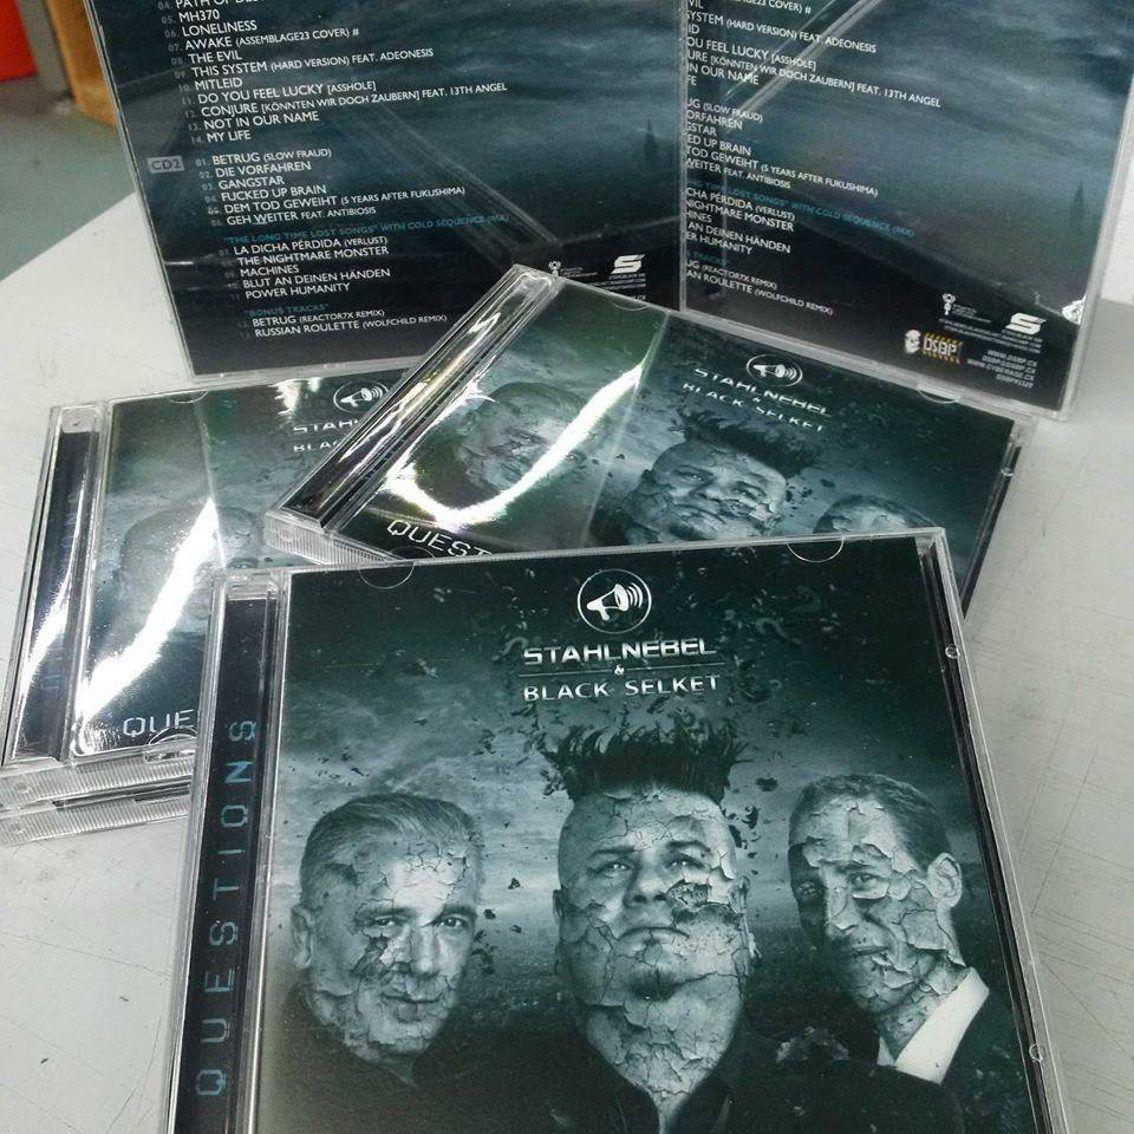 Stahlnebel & Black Selket offer new'Questions' album as double CD set - listen to the teaser